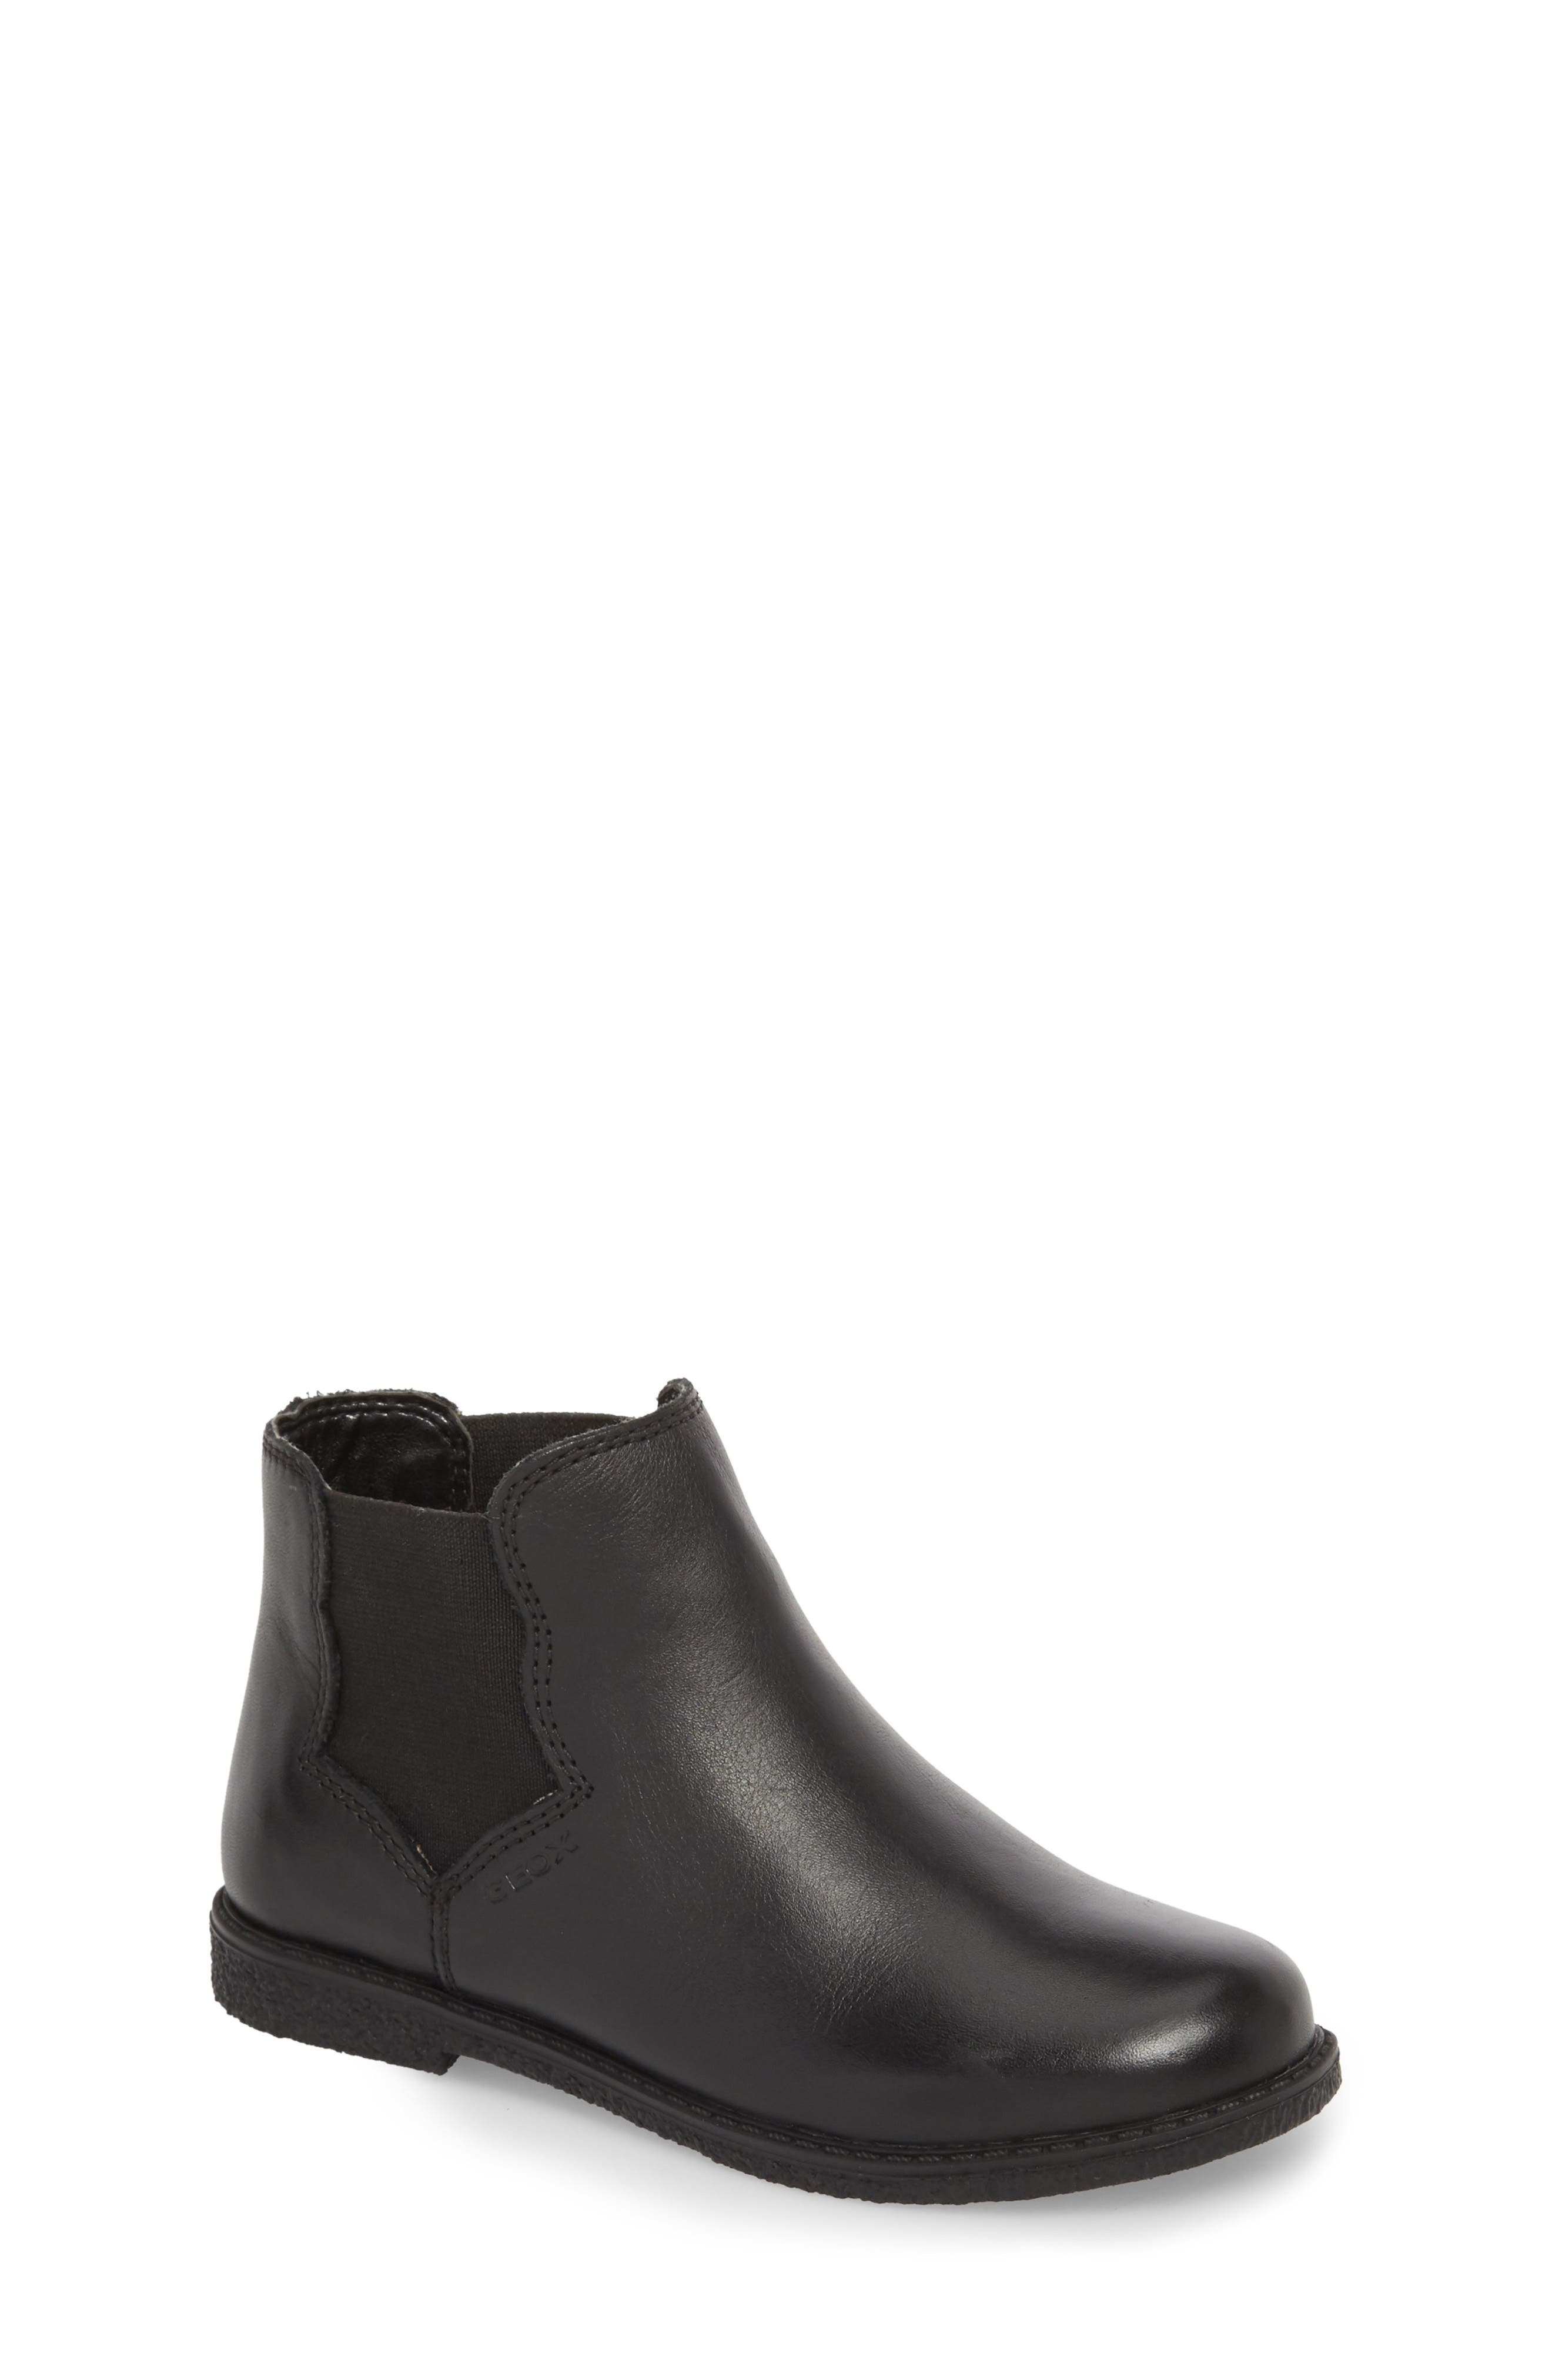 Shawntel Chelsea Boot,                         Main,                         color, 001